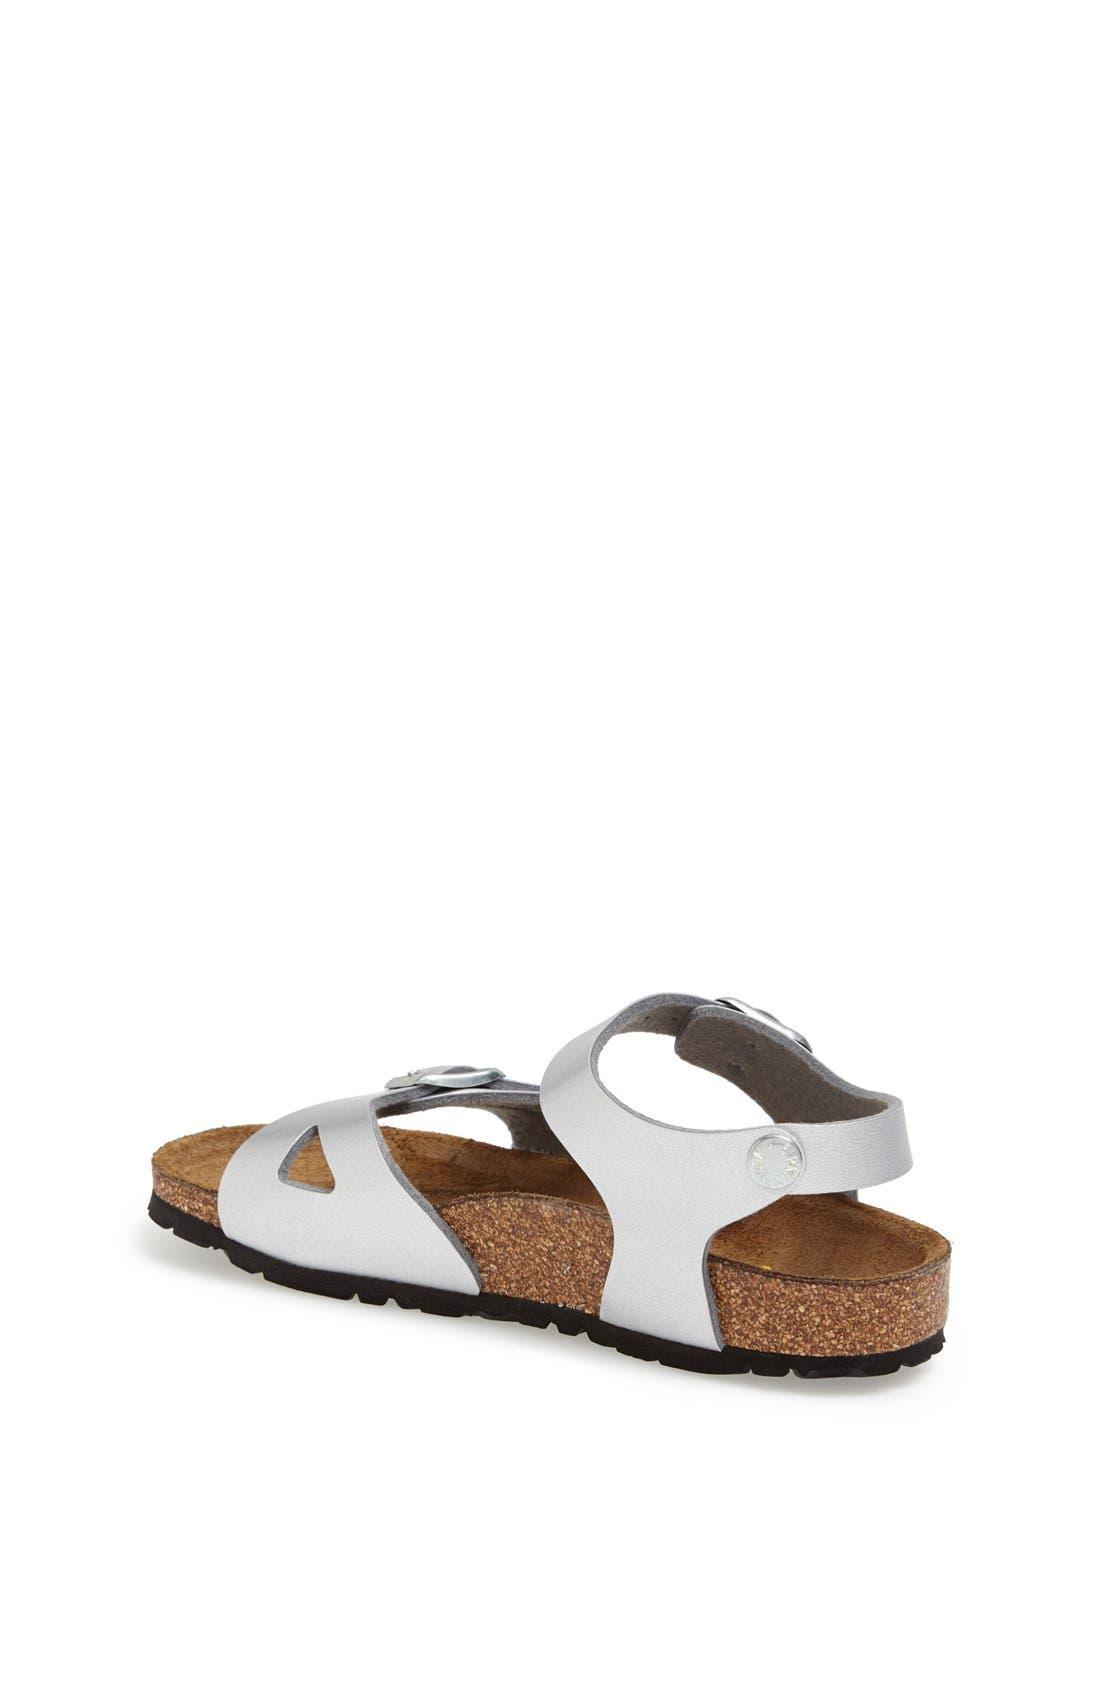 'Rio Birko-Flor<sup>™</sup>' Sandal,                             Alternate thumbnail 4, color,                             040